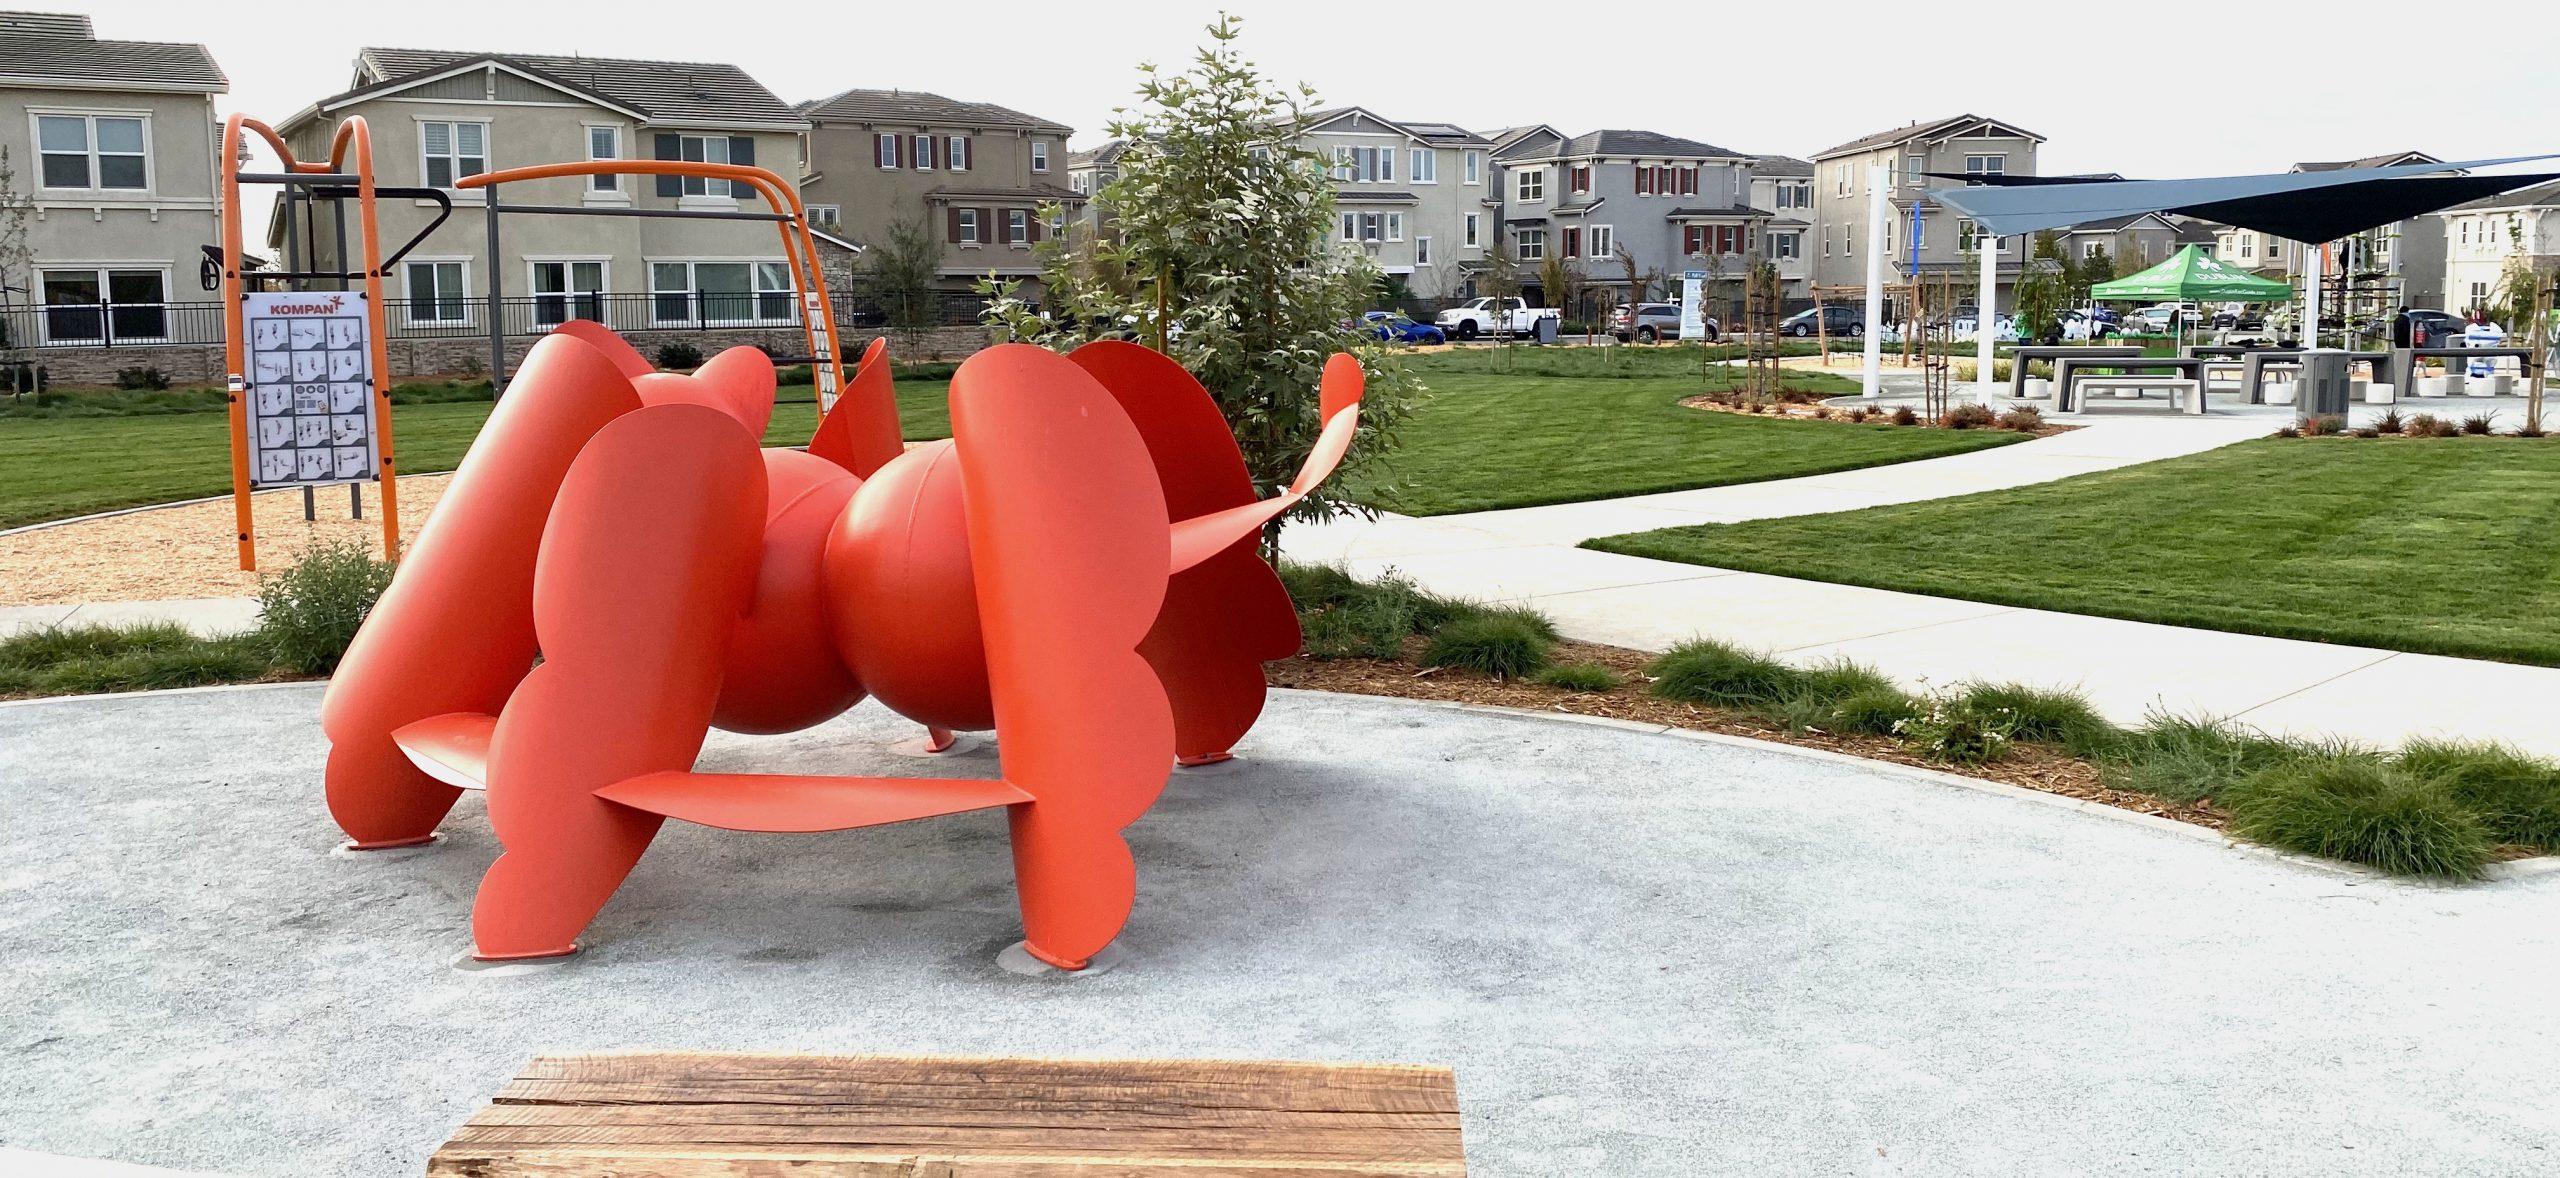 Arachnicat, an eco-friendly biomorphic sculpture & play structure